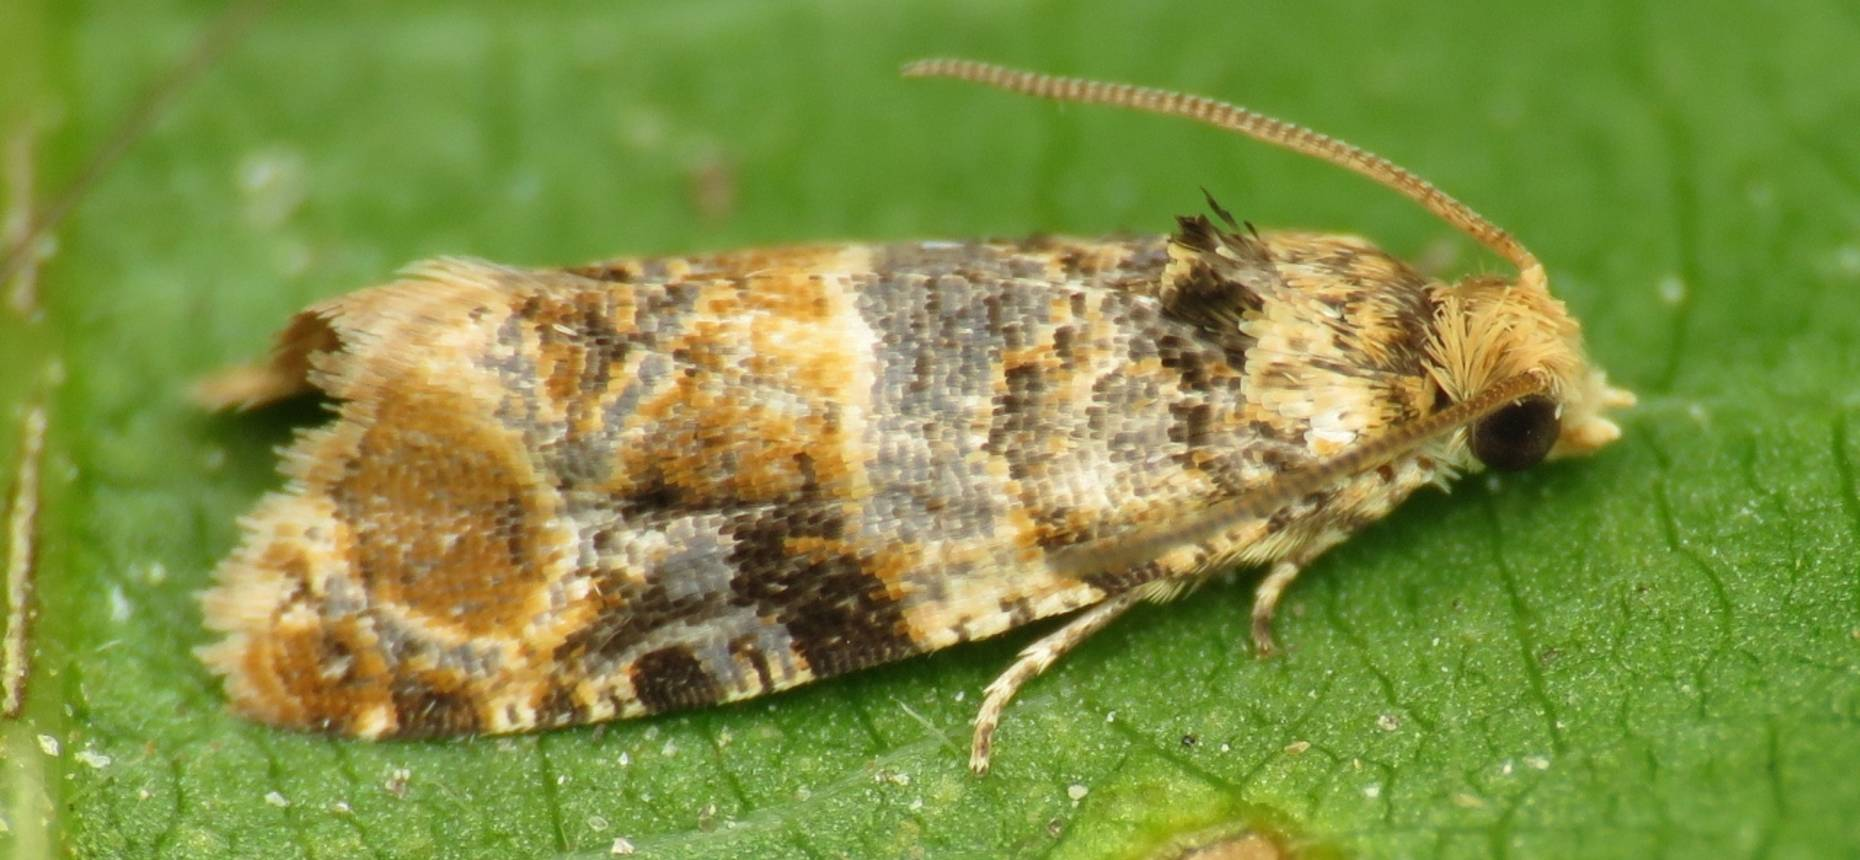 Гроздевая листовертка - Lobesia botrana (Den. et Schiff.)